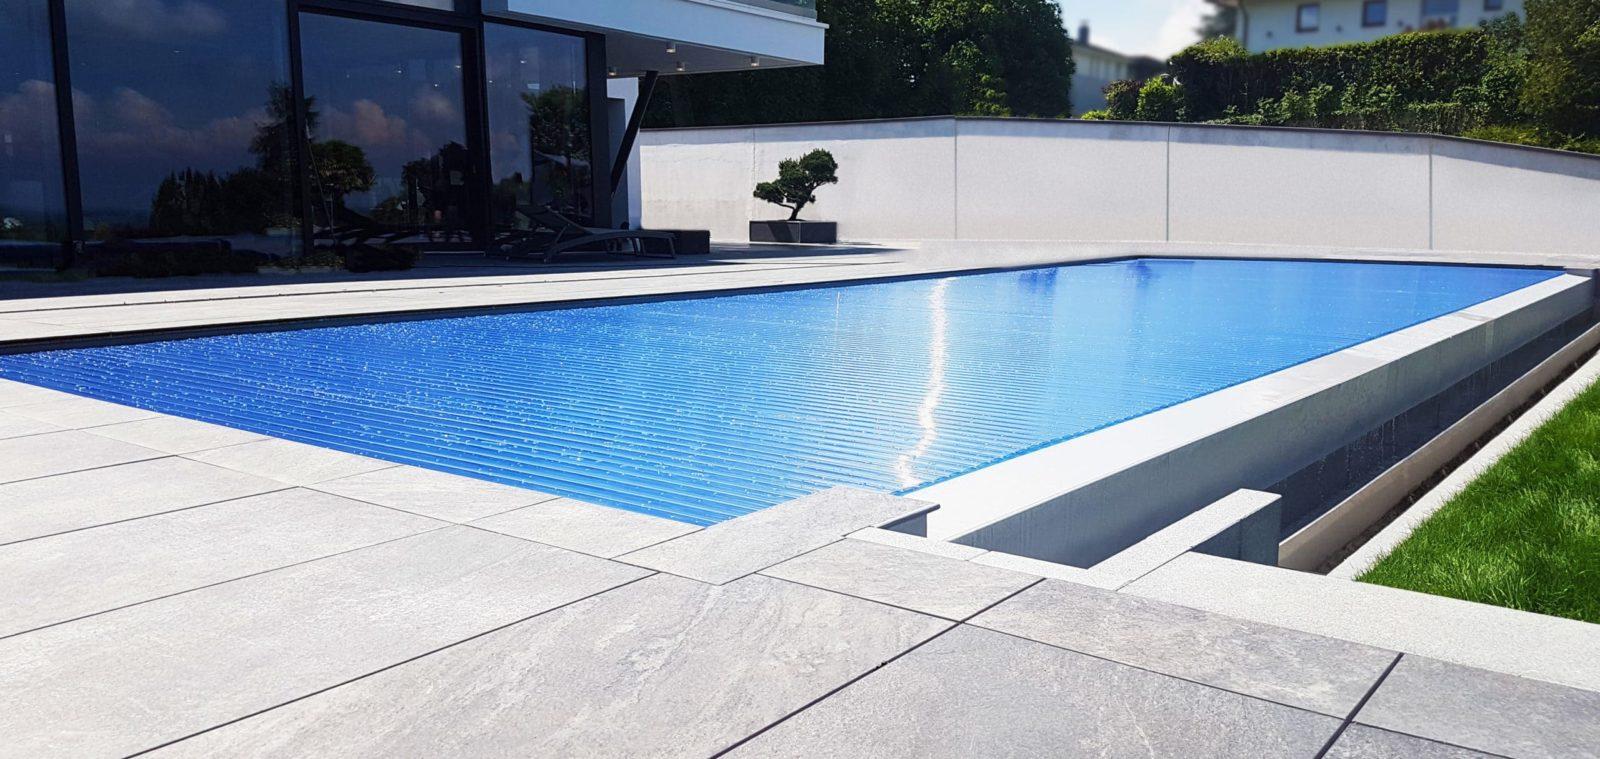 Teichmann-Rollo-Solar-Design-Pool-Cover-PC